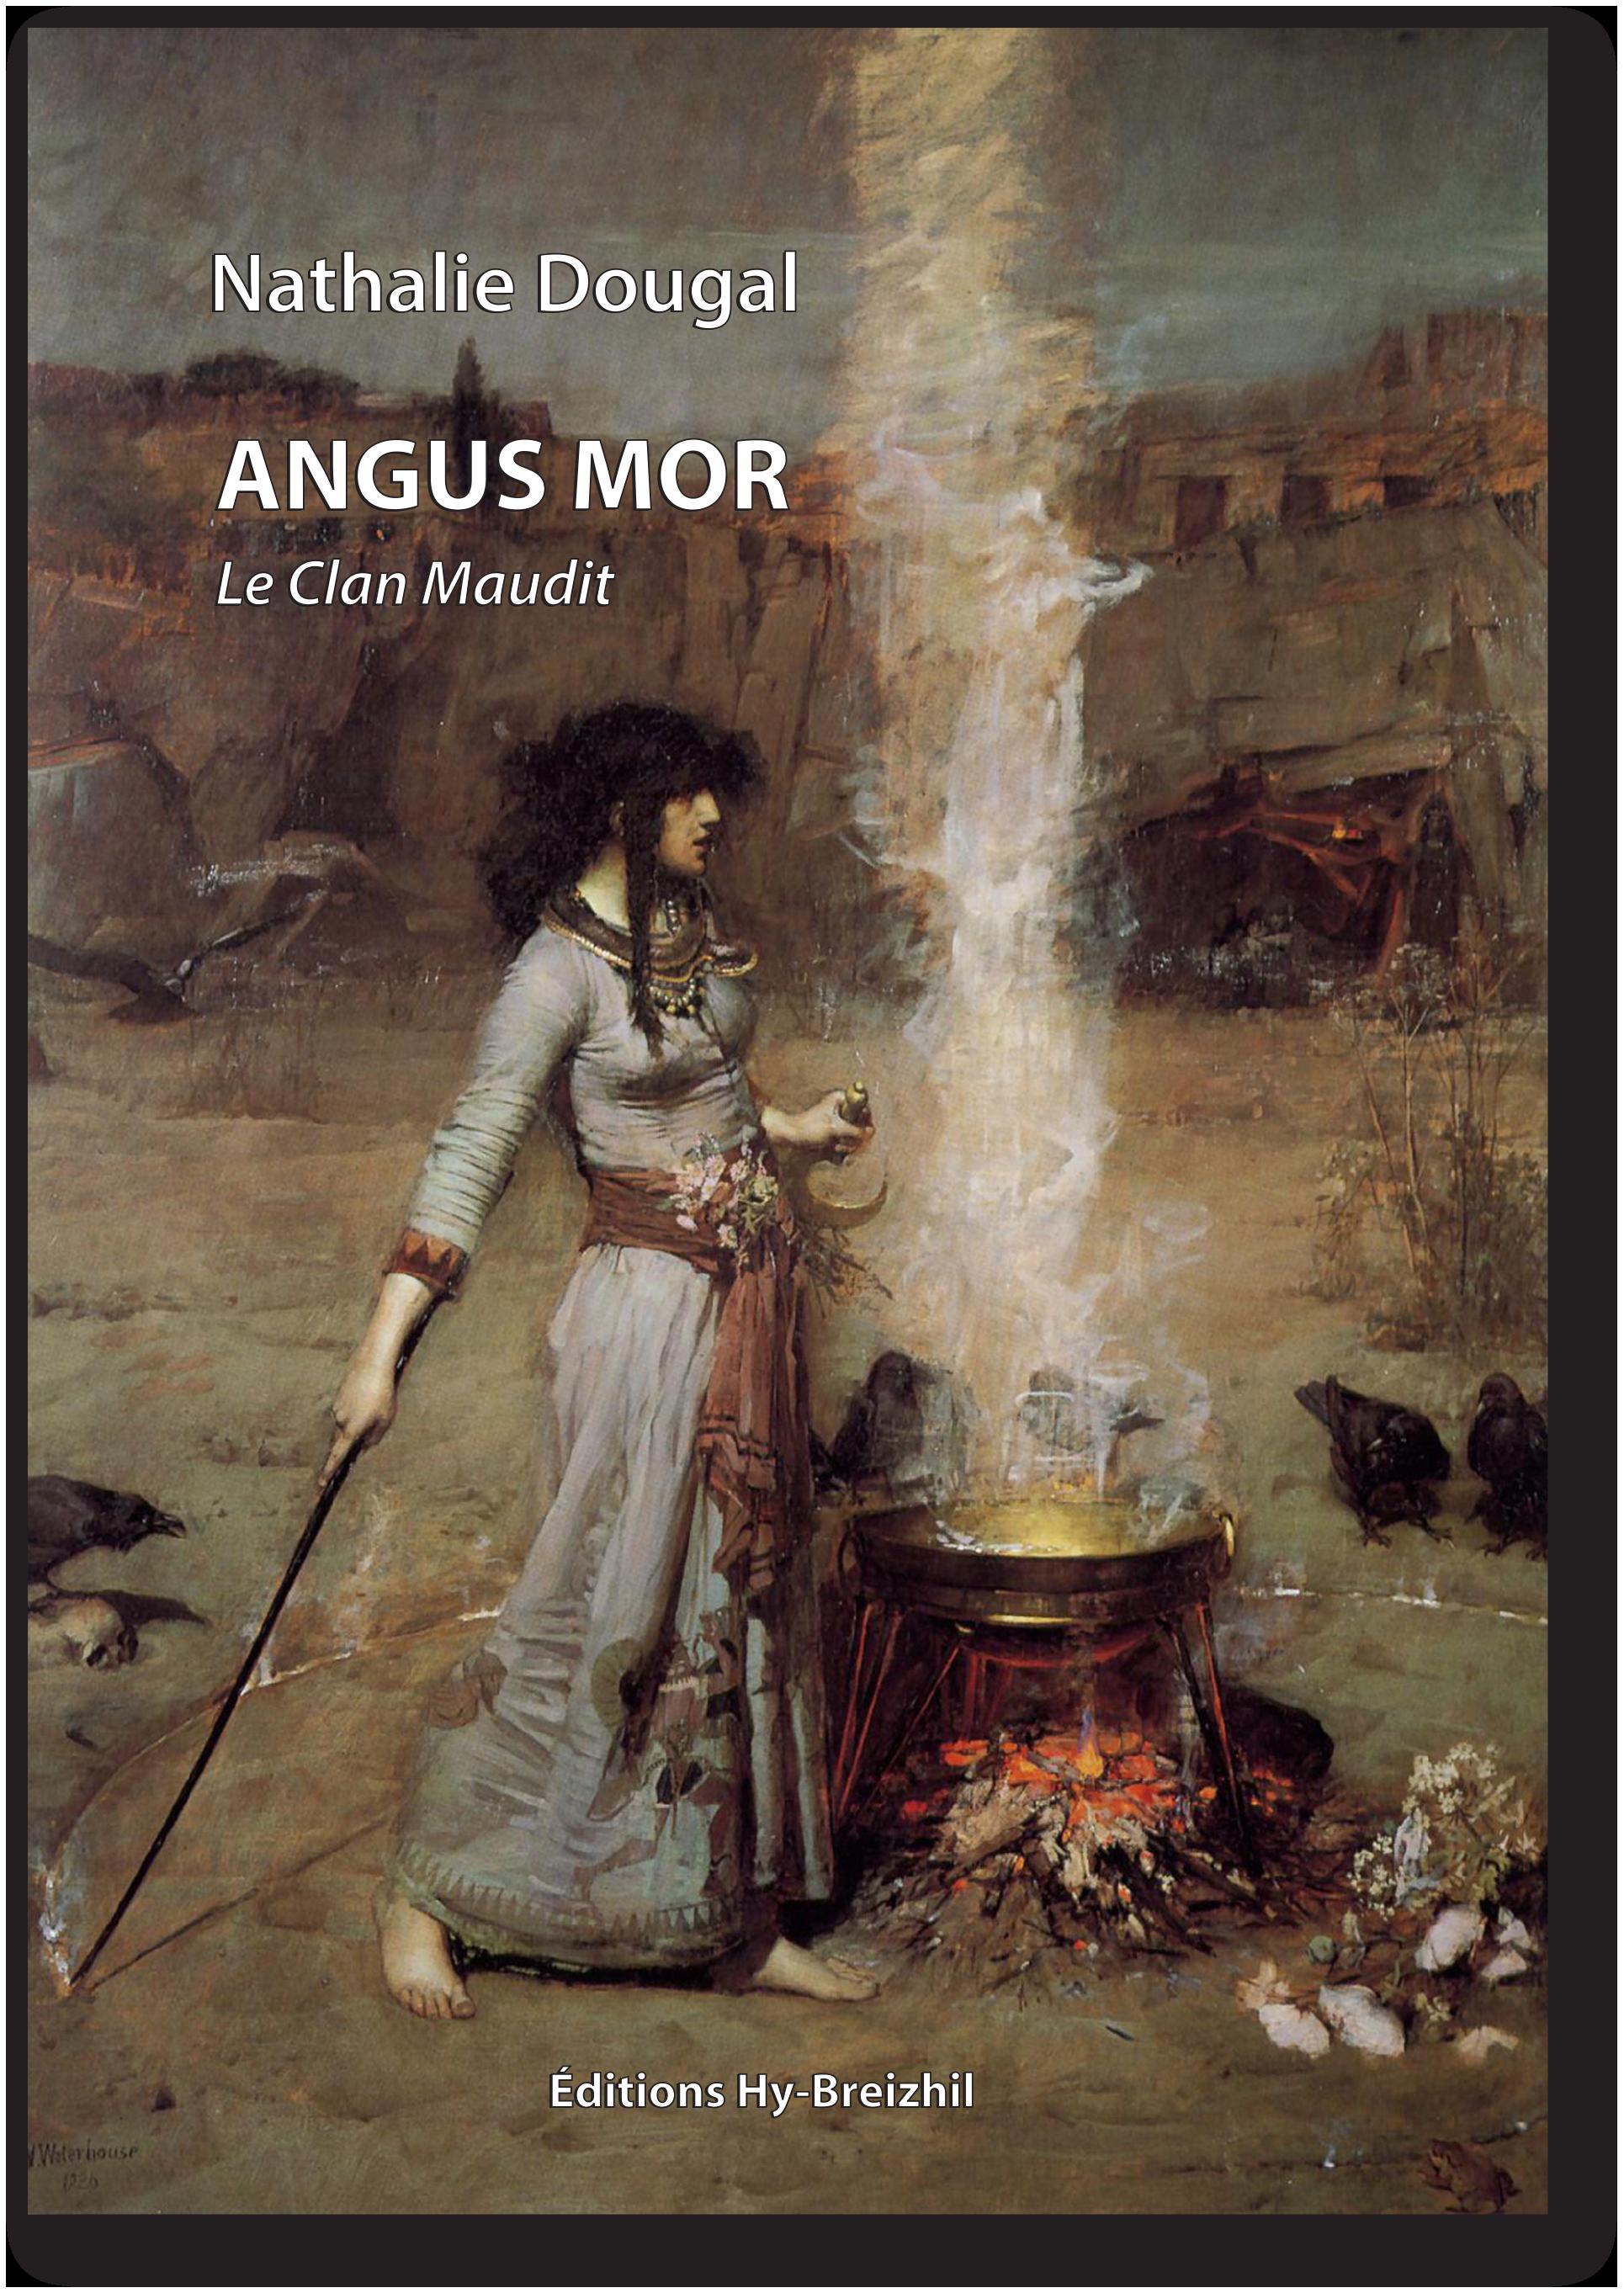 Nathalie DOUGAL - Angus Mor : Le clan maudit